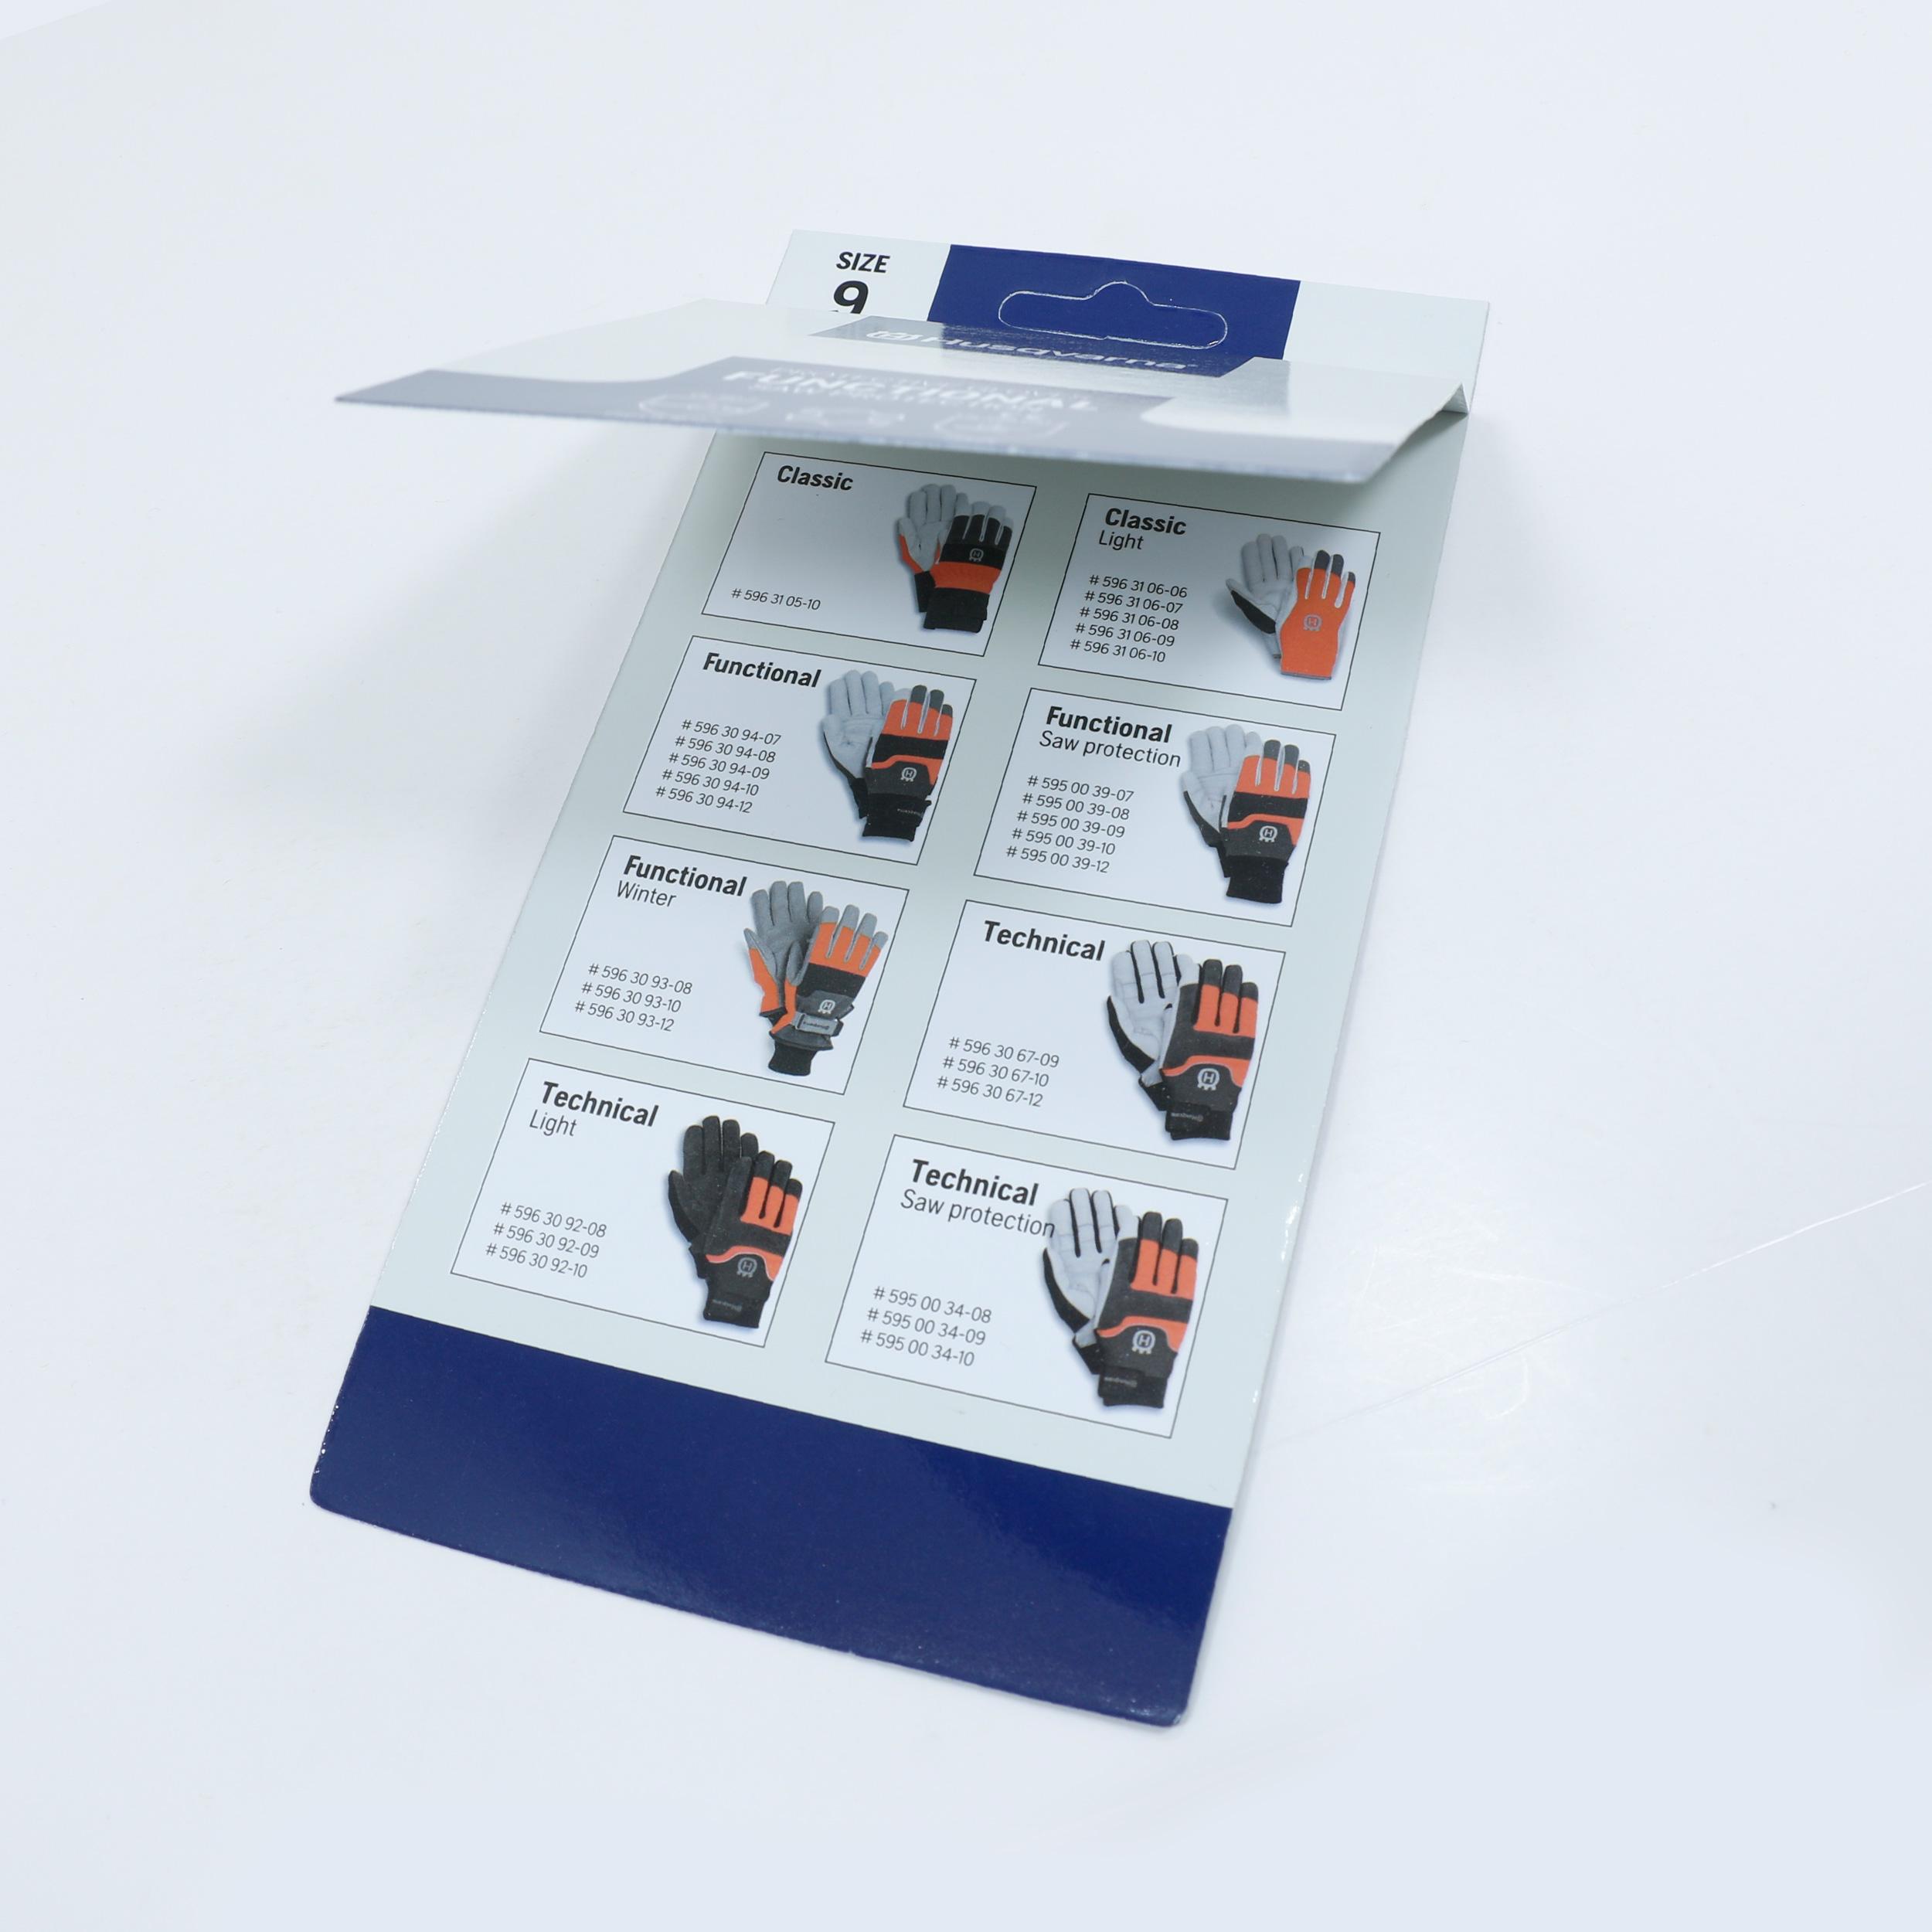 Printing & Packaging Company - Town Crier | Pakistan | India | Bangladesh | Cambodia | SriLanka | Russia | Moscow | St Petersburg | Ukraine | Belarus | Kazakhstan | Uzbekistan | Kyrgyzstan | Turkmenistan | Poland | Romania | Finland | Italy | Germany | Uganda | Sodan | Kenya | Custom Hang Tags | swing tags | hang tags for clothing | swing tag printing | clothing swing tags | folded hang tags | kraft swing tags | apparel hang tags | embossed hang tags | logo hang tags | custom bottle neck tags | product tags printing | fabric swing tags